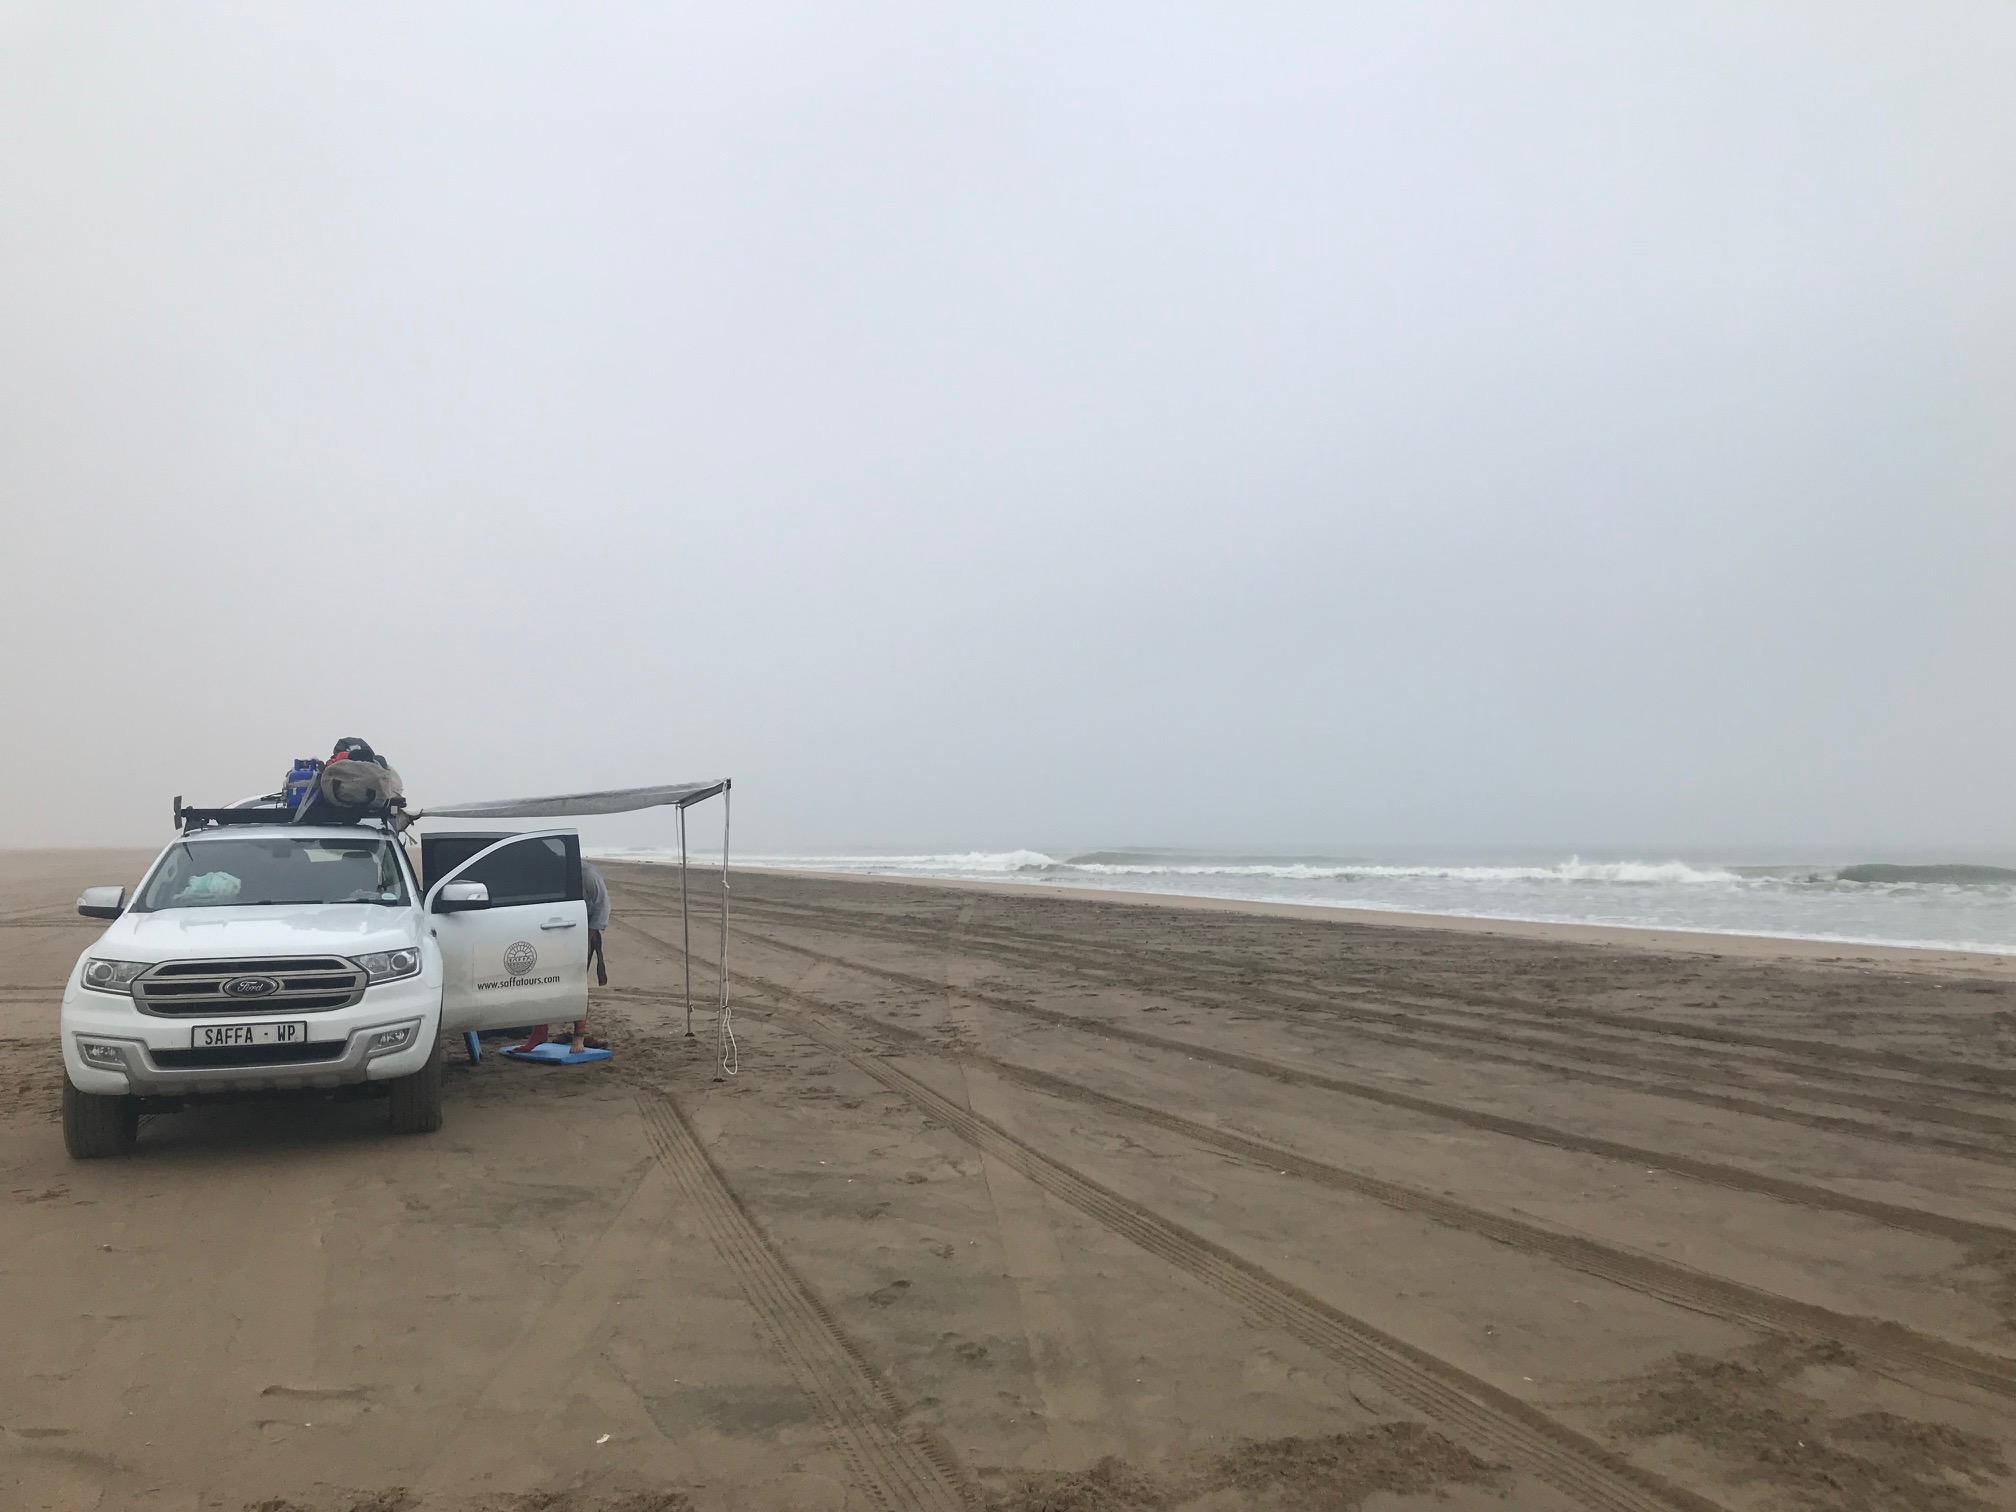 donkey-bay-namibia-surf-trip